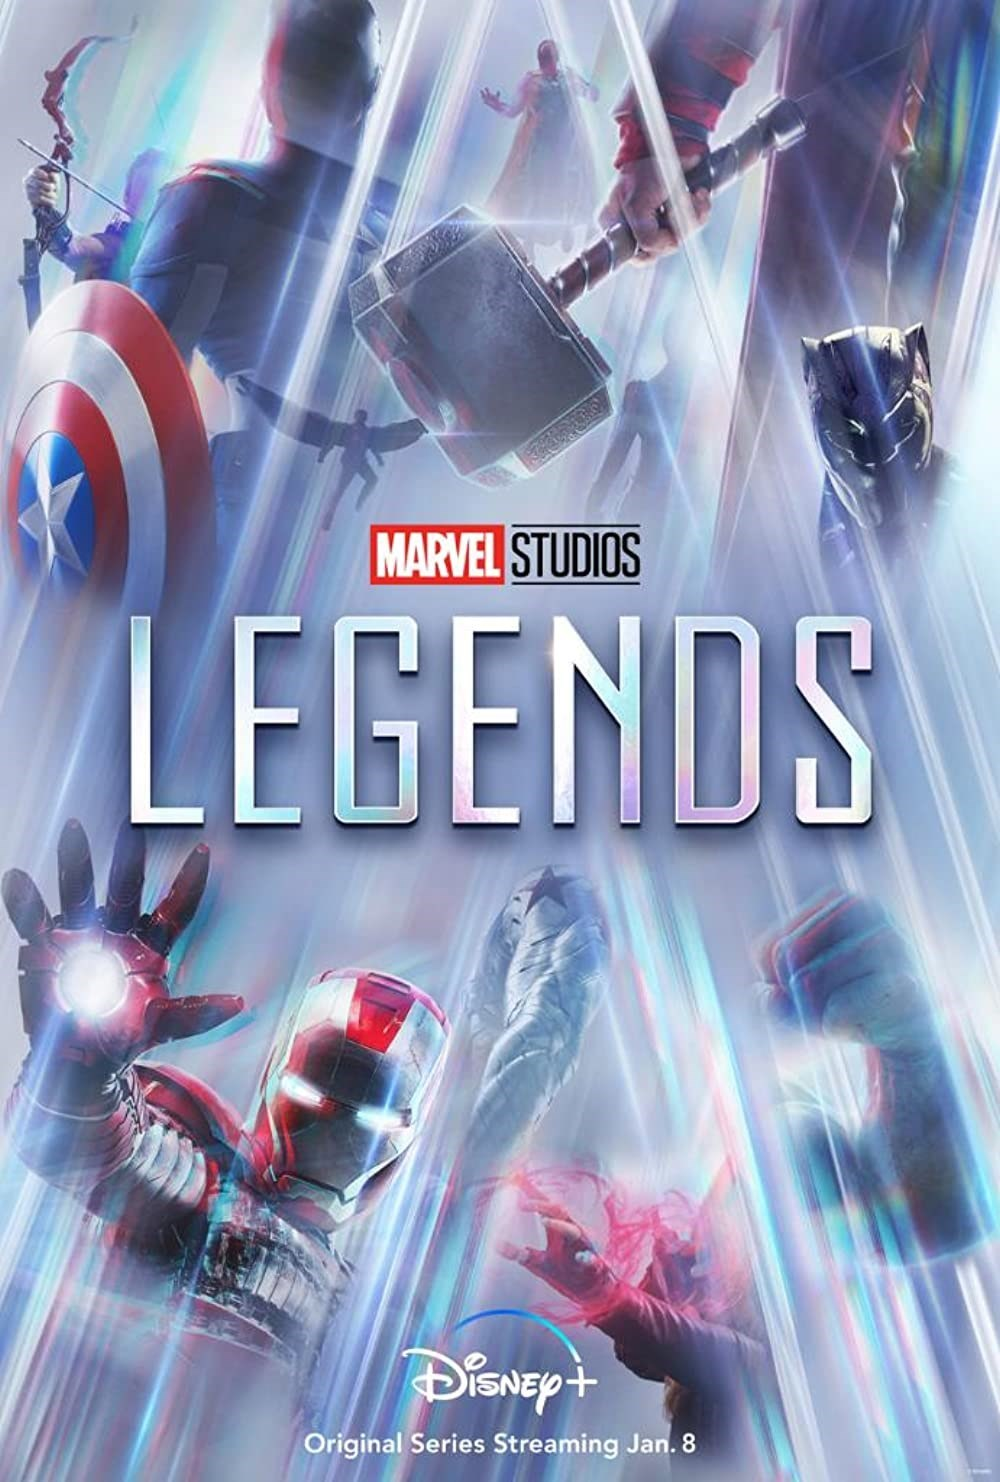 Marvel Studios: Legends kapak